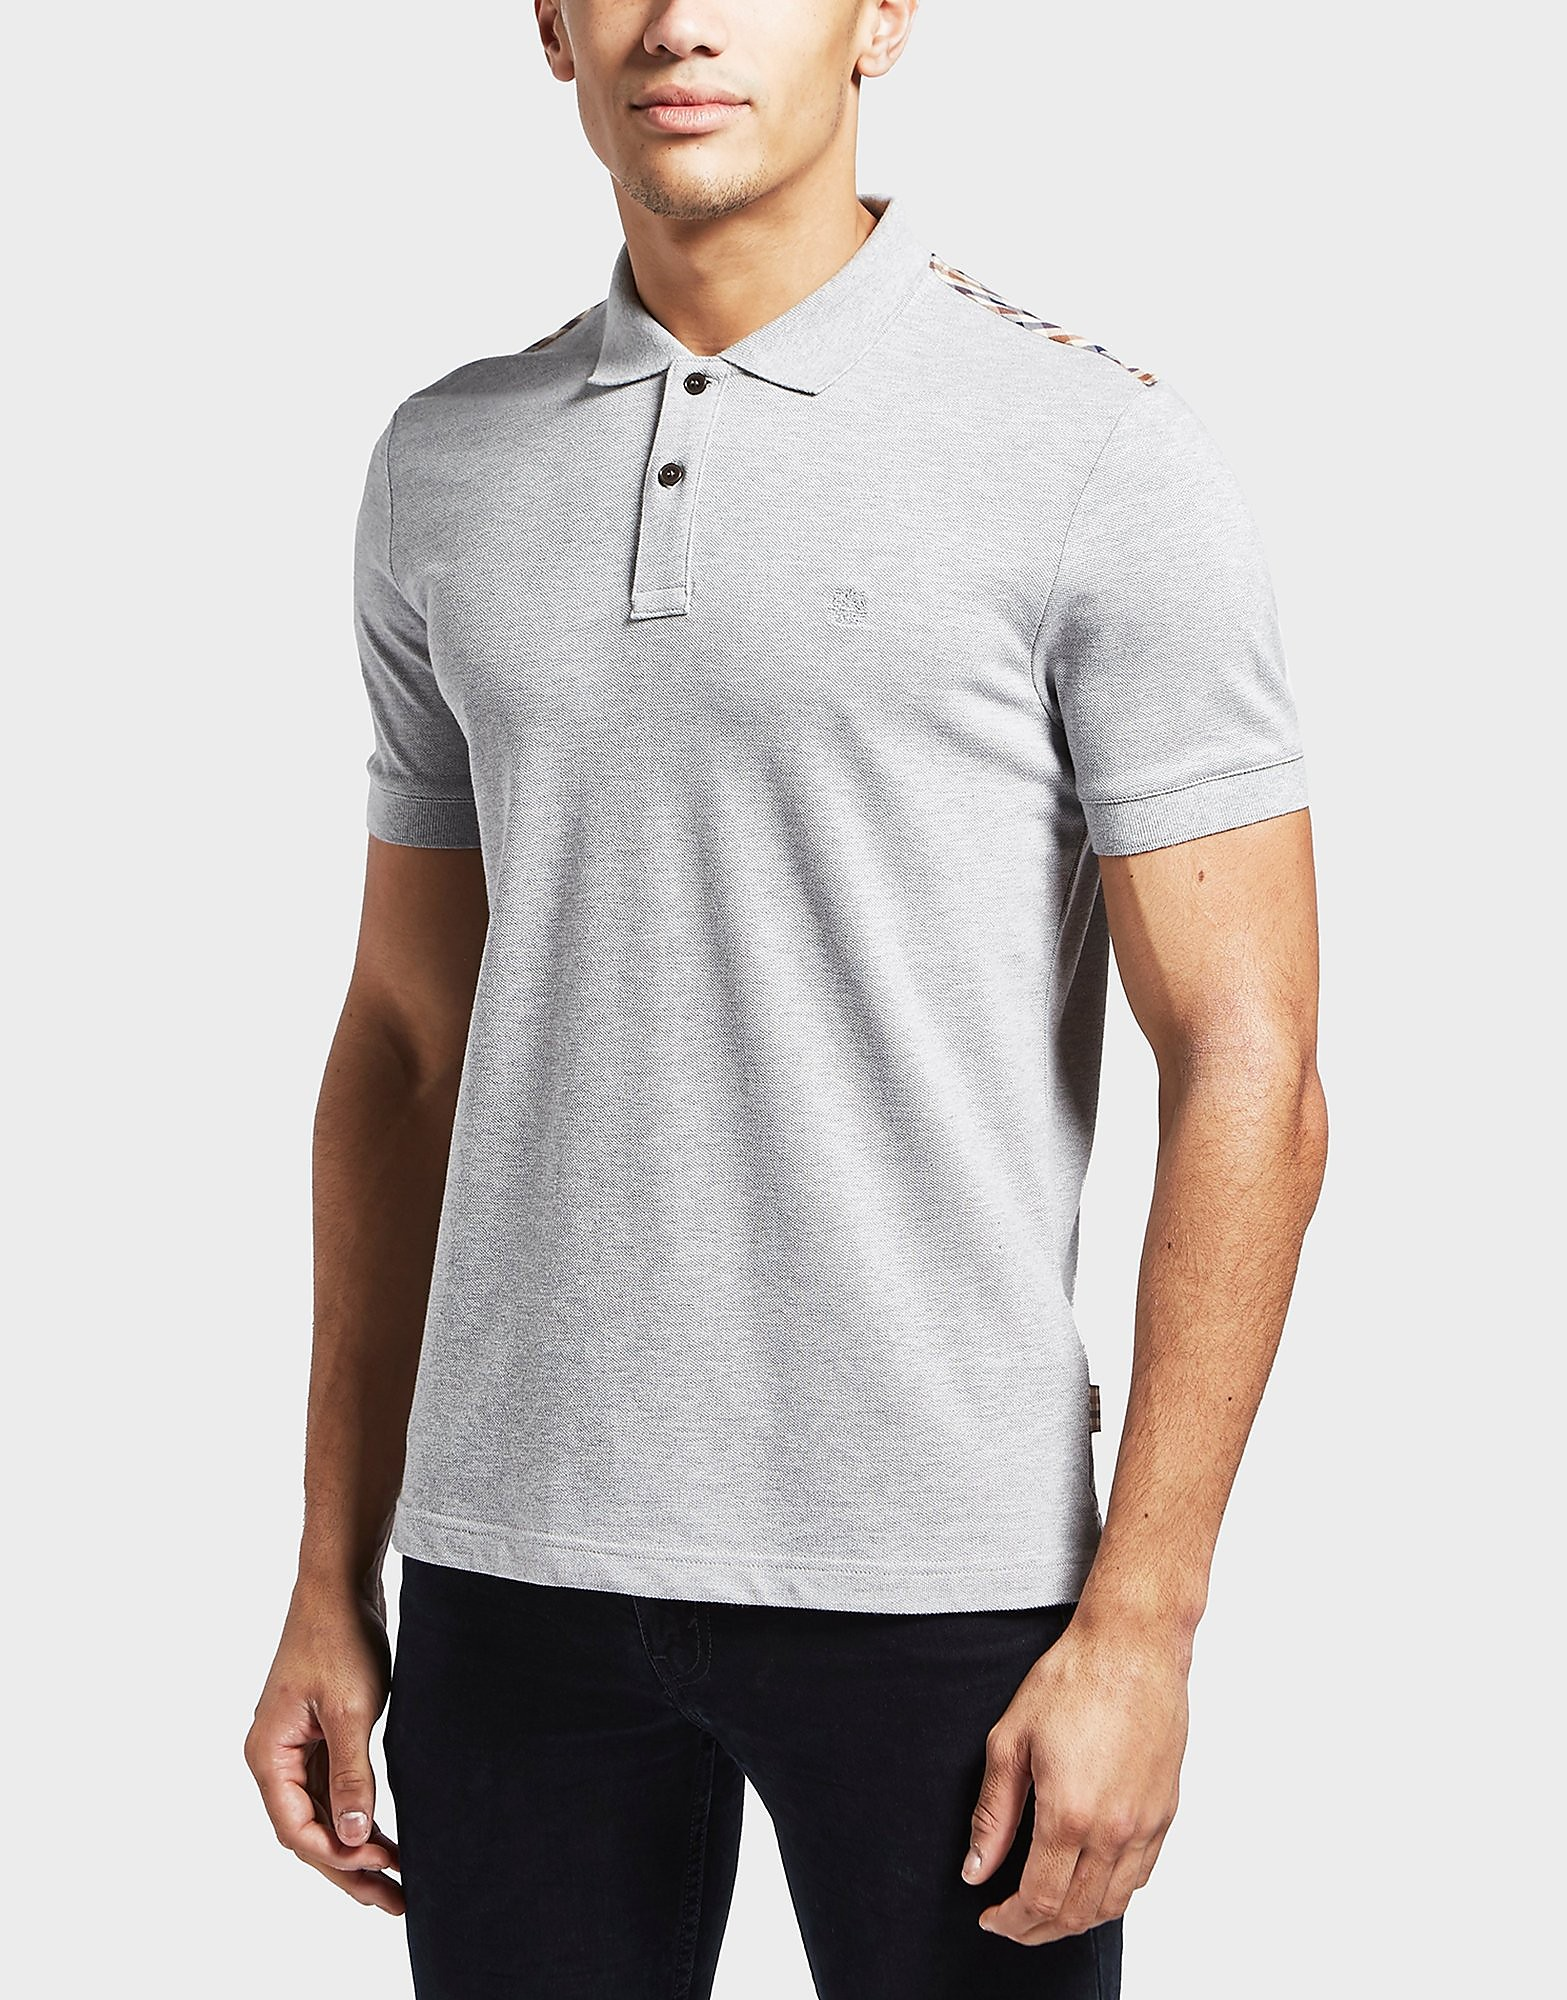 Aquascutum Hill Check Shoulder Short Sleeve Polo Shirt